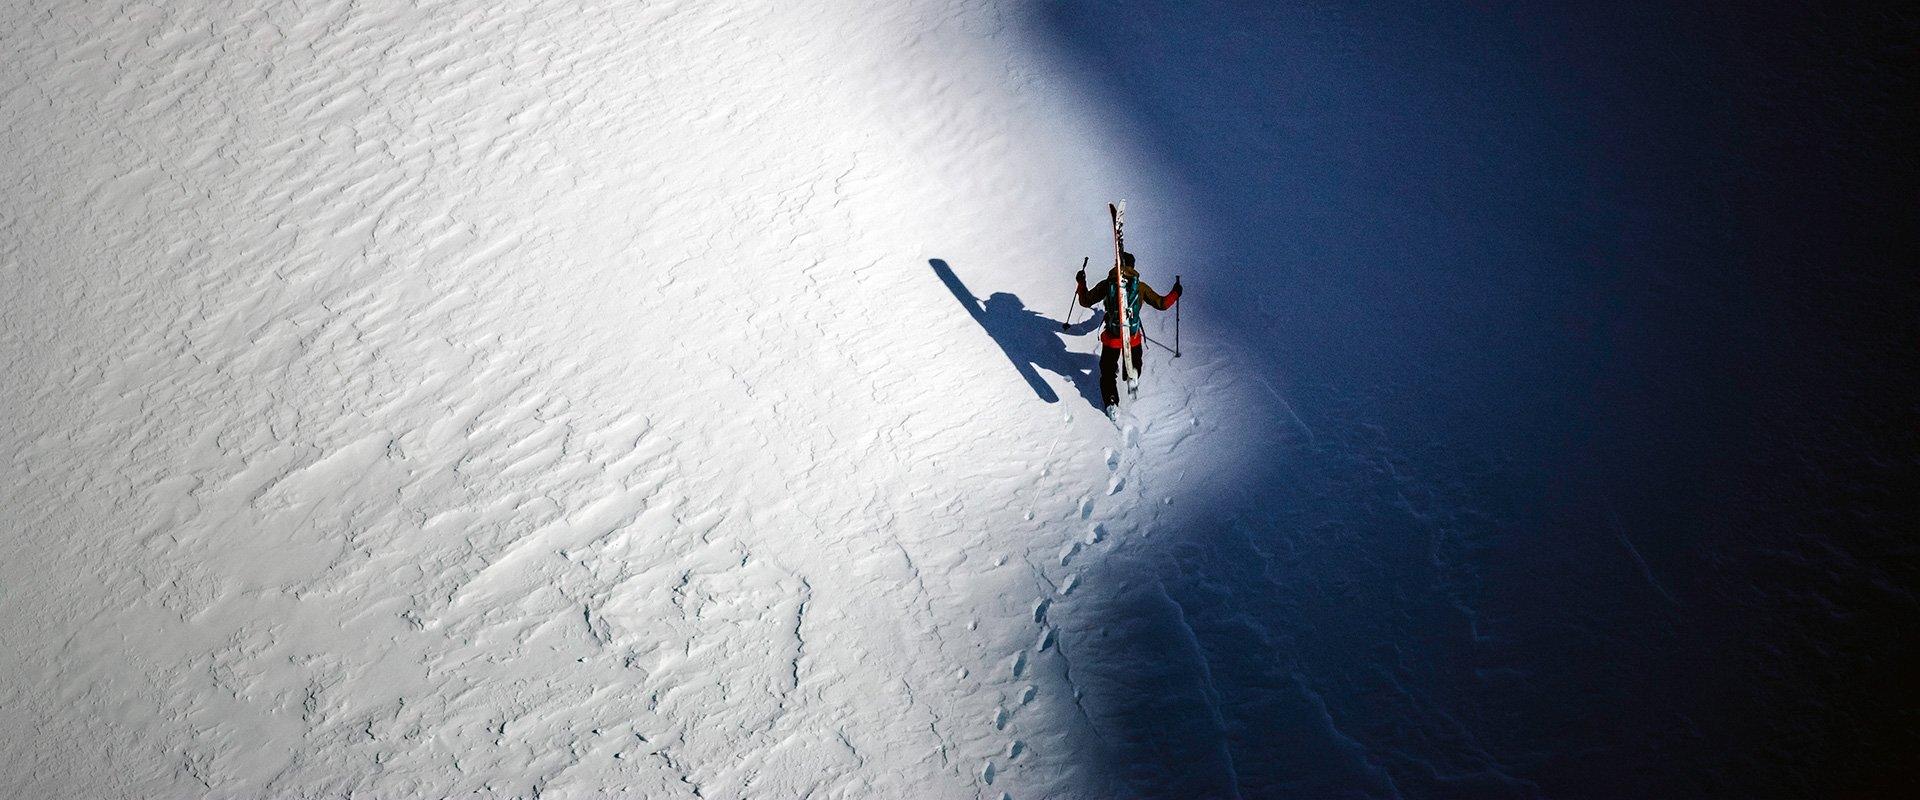 vimff fall series snowsport show mt cain title bg